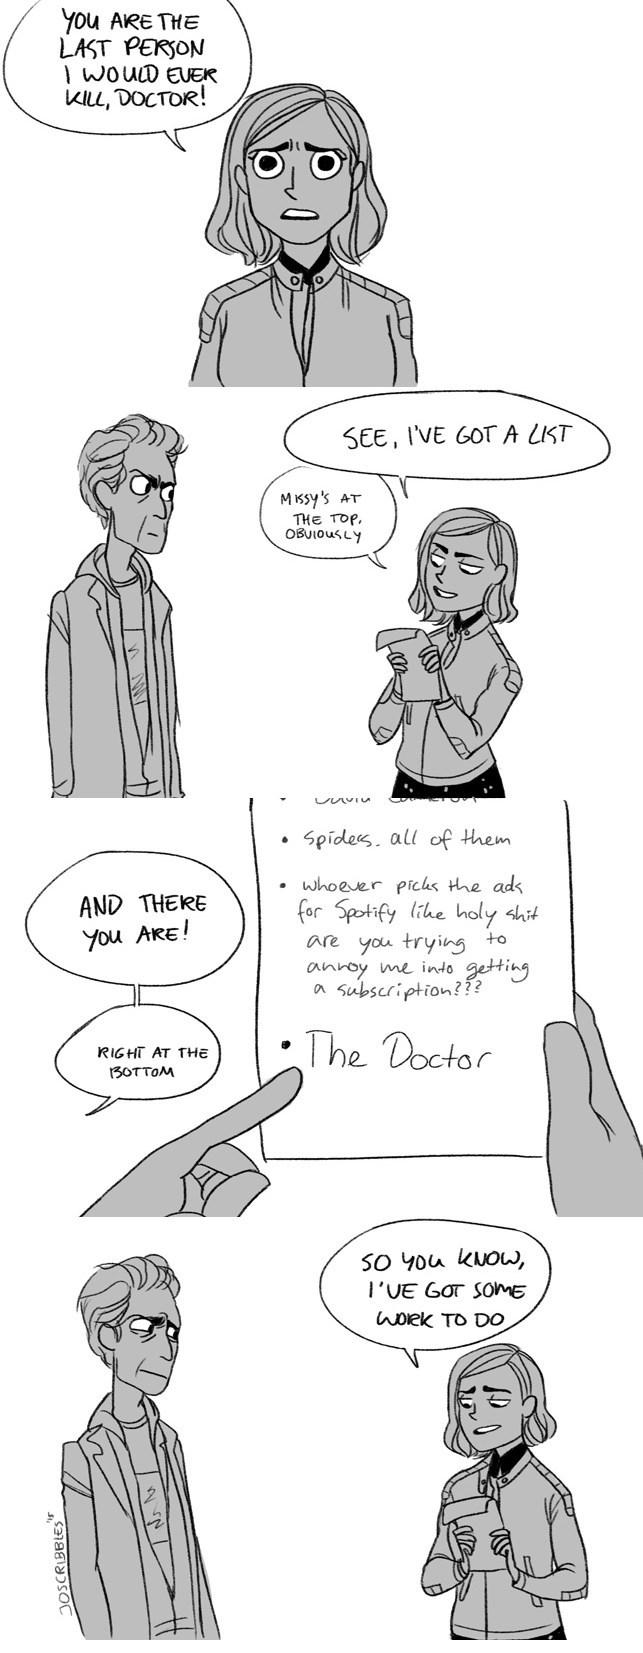 funny-doctor-who-clara-oswald-kill-list-web-comic